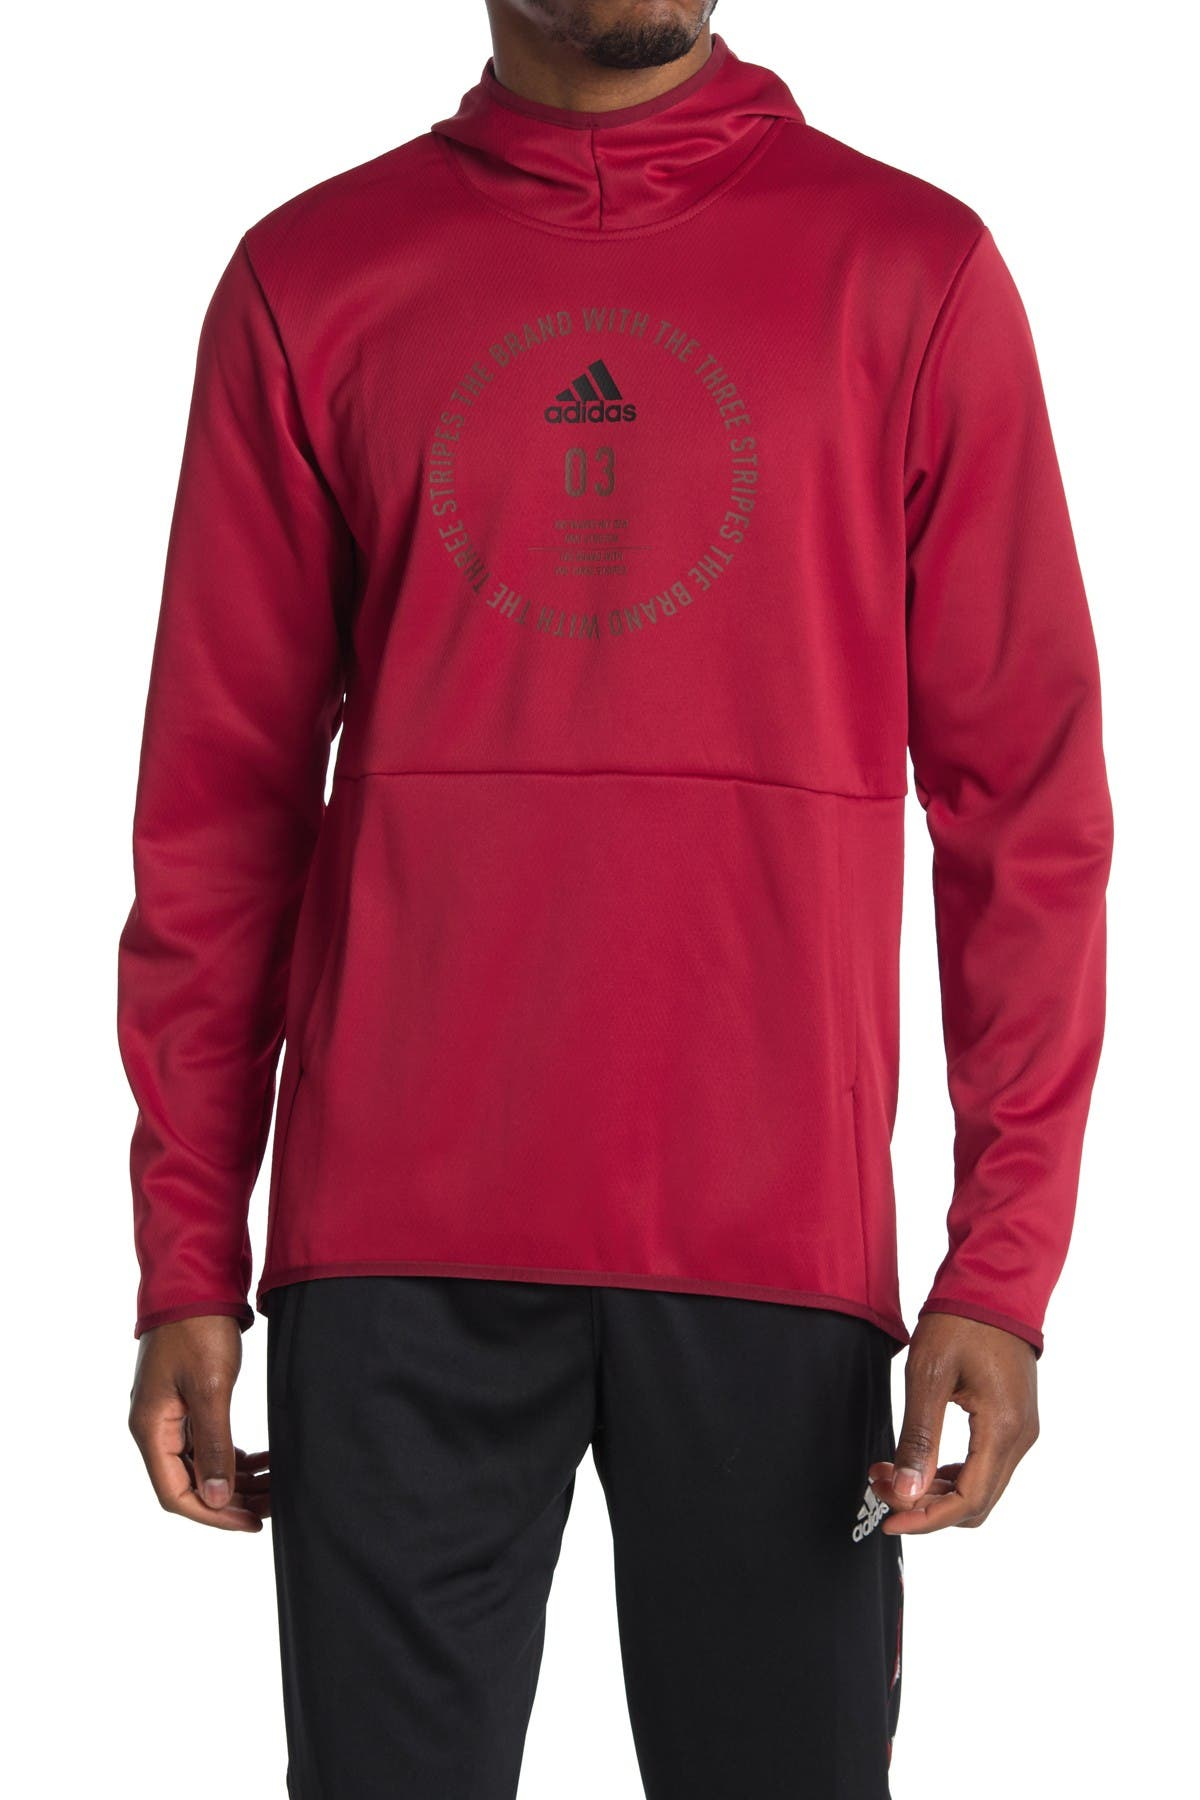 Image of adidas Team Issue Badge of Sport Hoodie